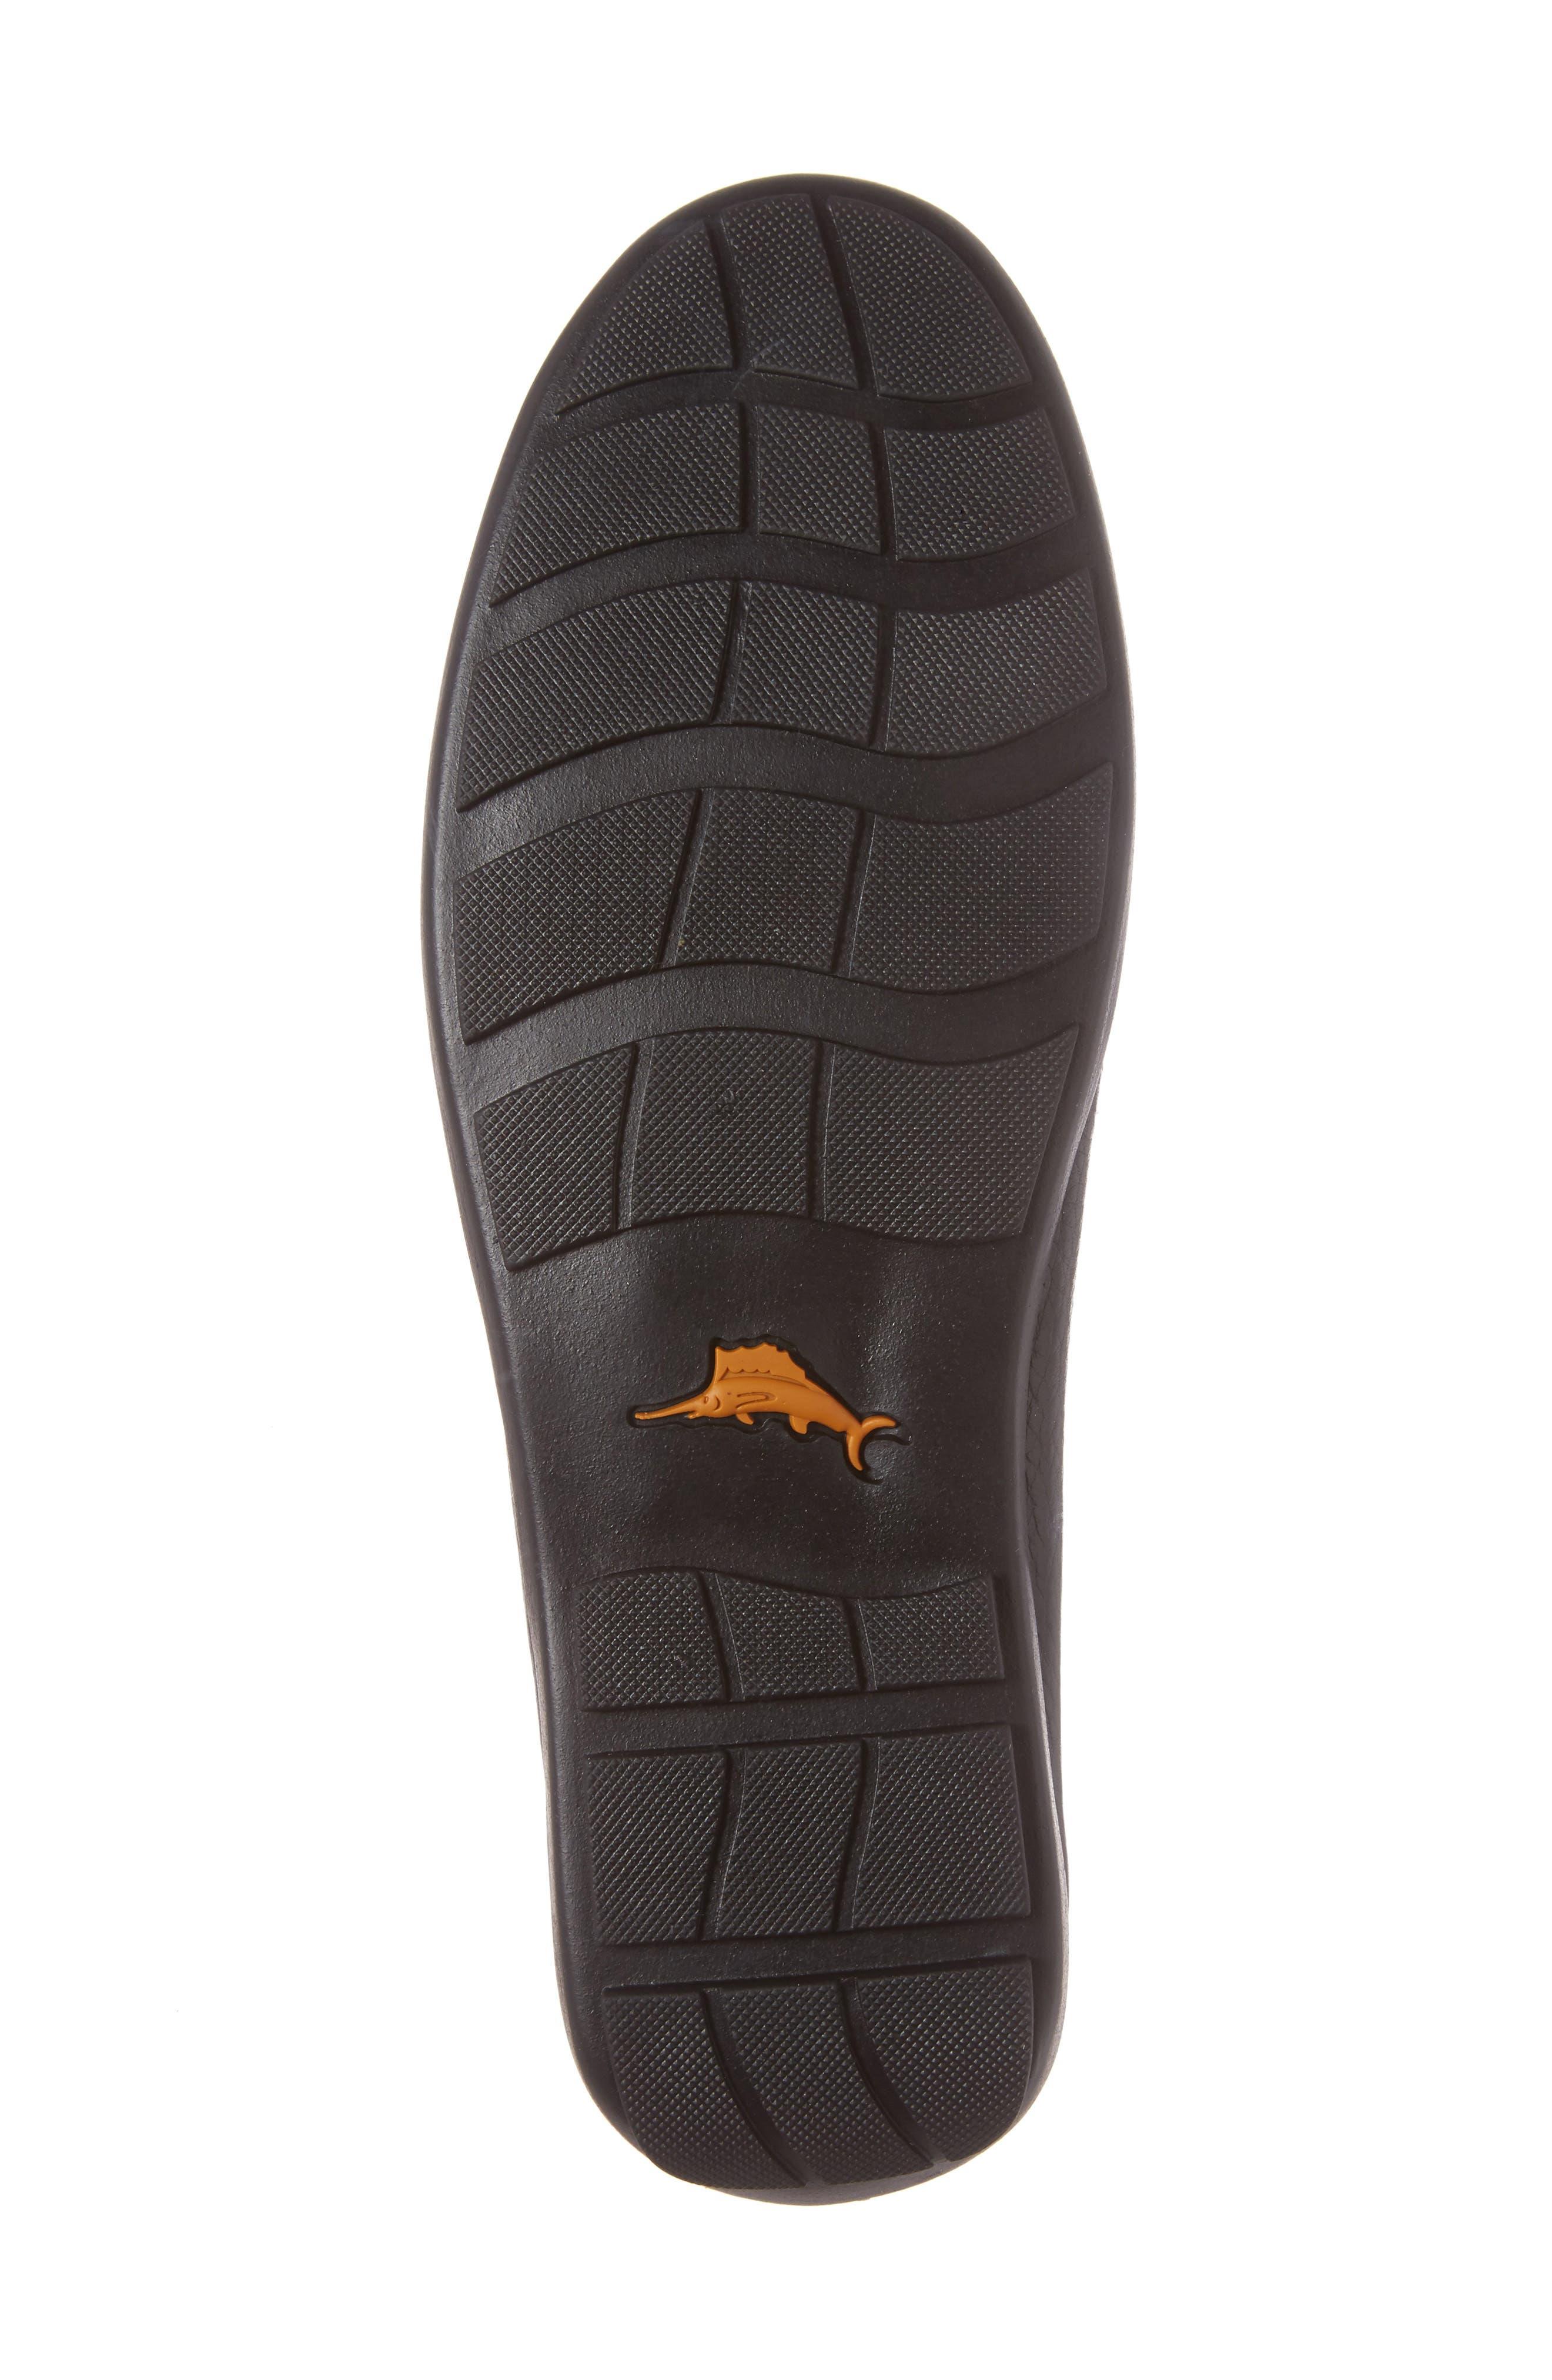 Orion Venetian Loafer,                             Alternate thumbnail 6, color,                             Black Leather